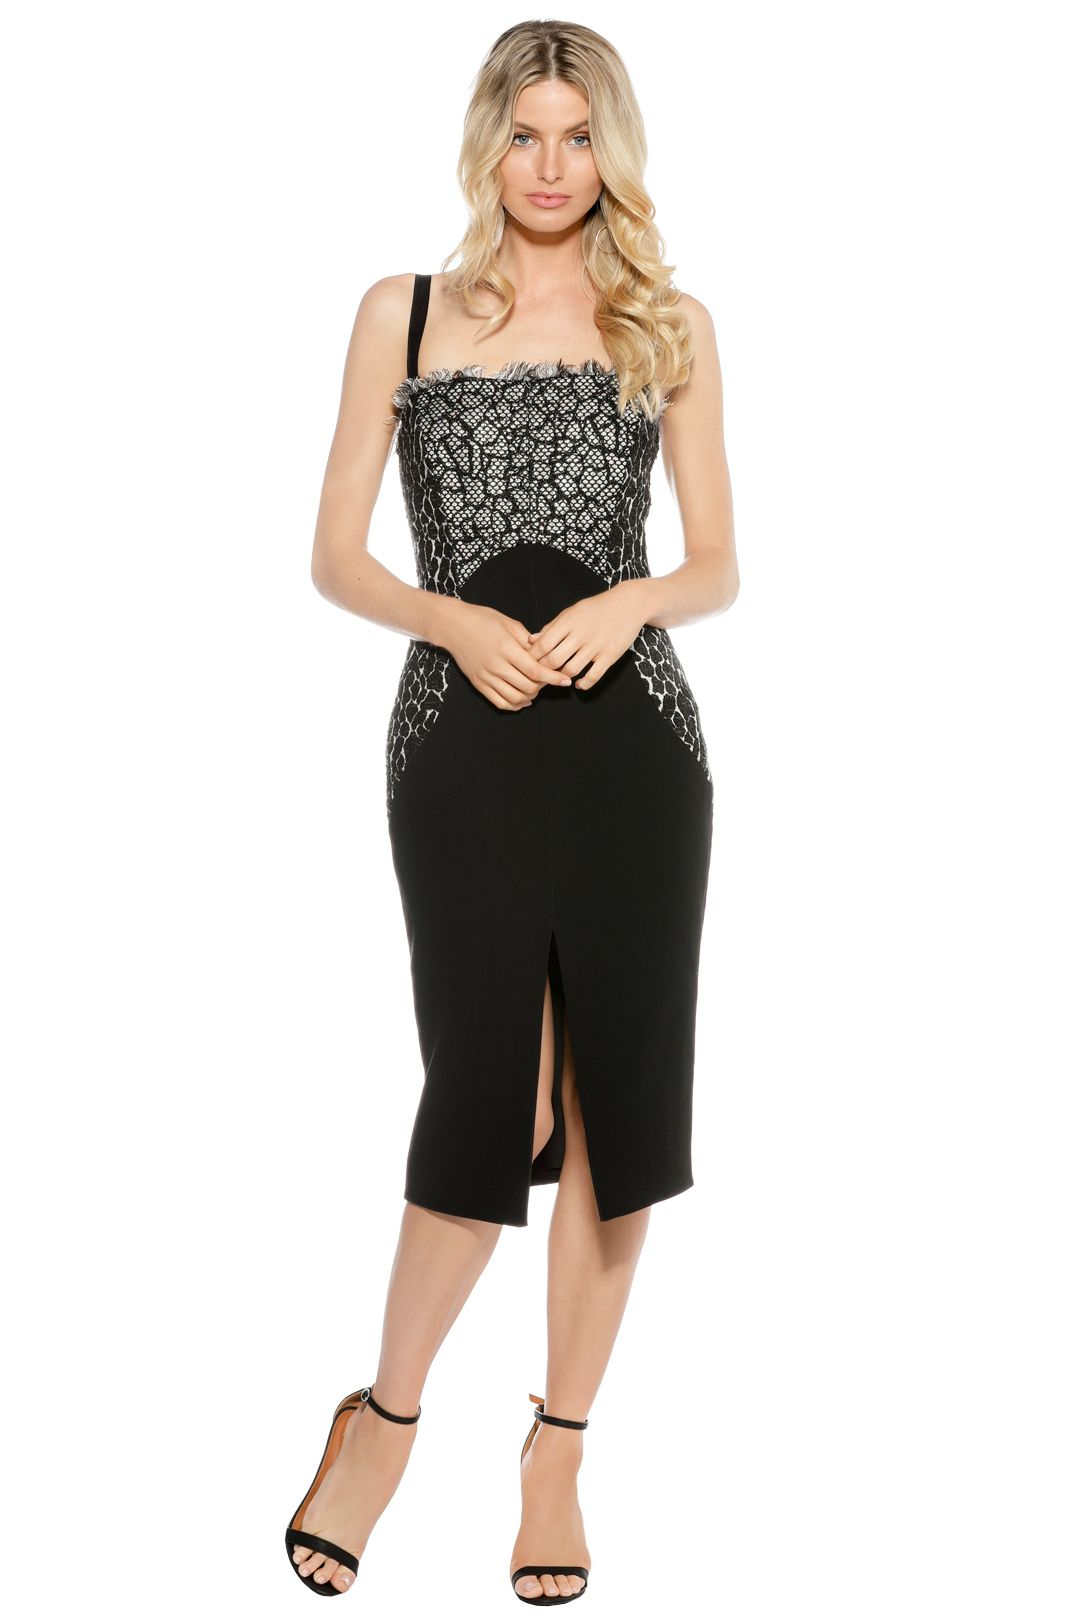 Ginger and Smart - Metallic Print Dress - Black - Front